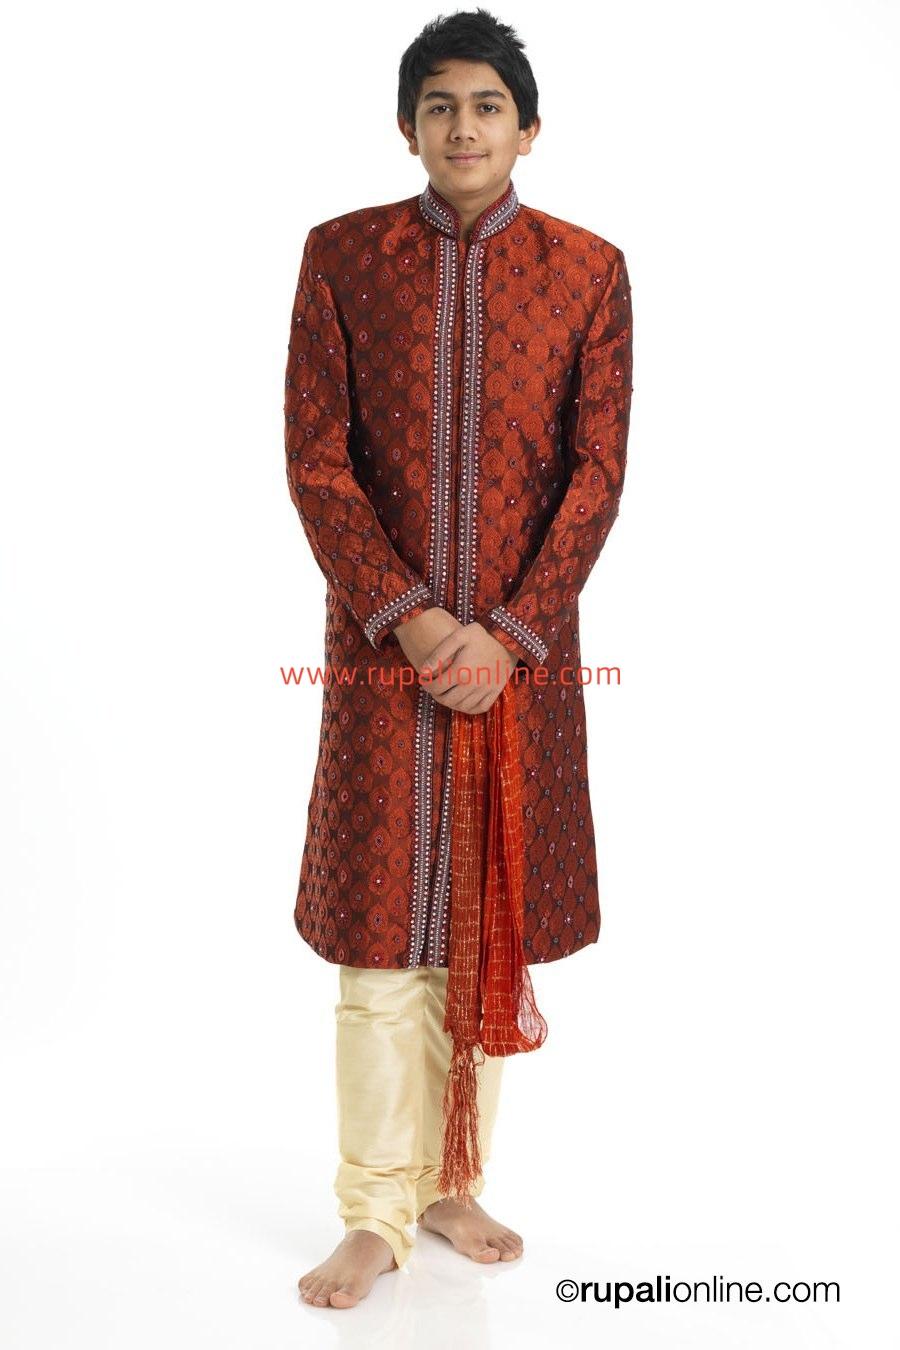 Rupali offers Indian kurta pajama & Wedding Sherwani in UK. Shop ...